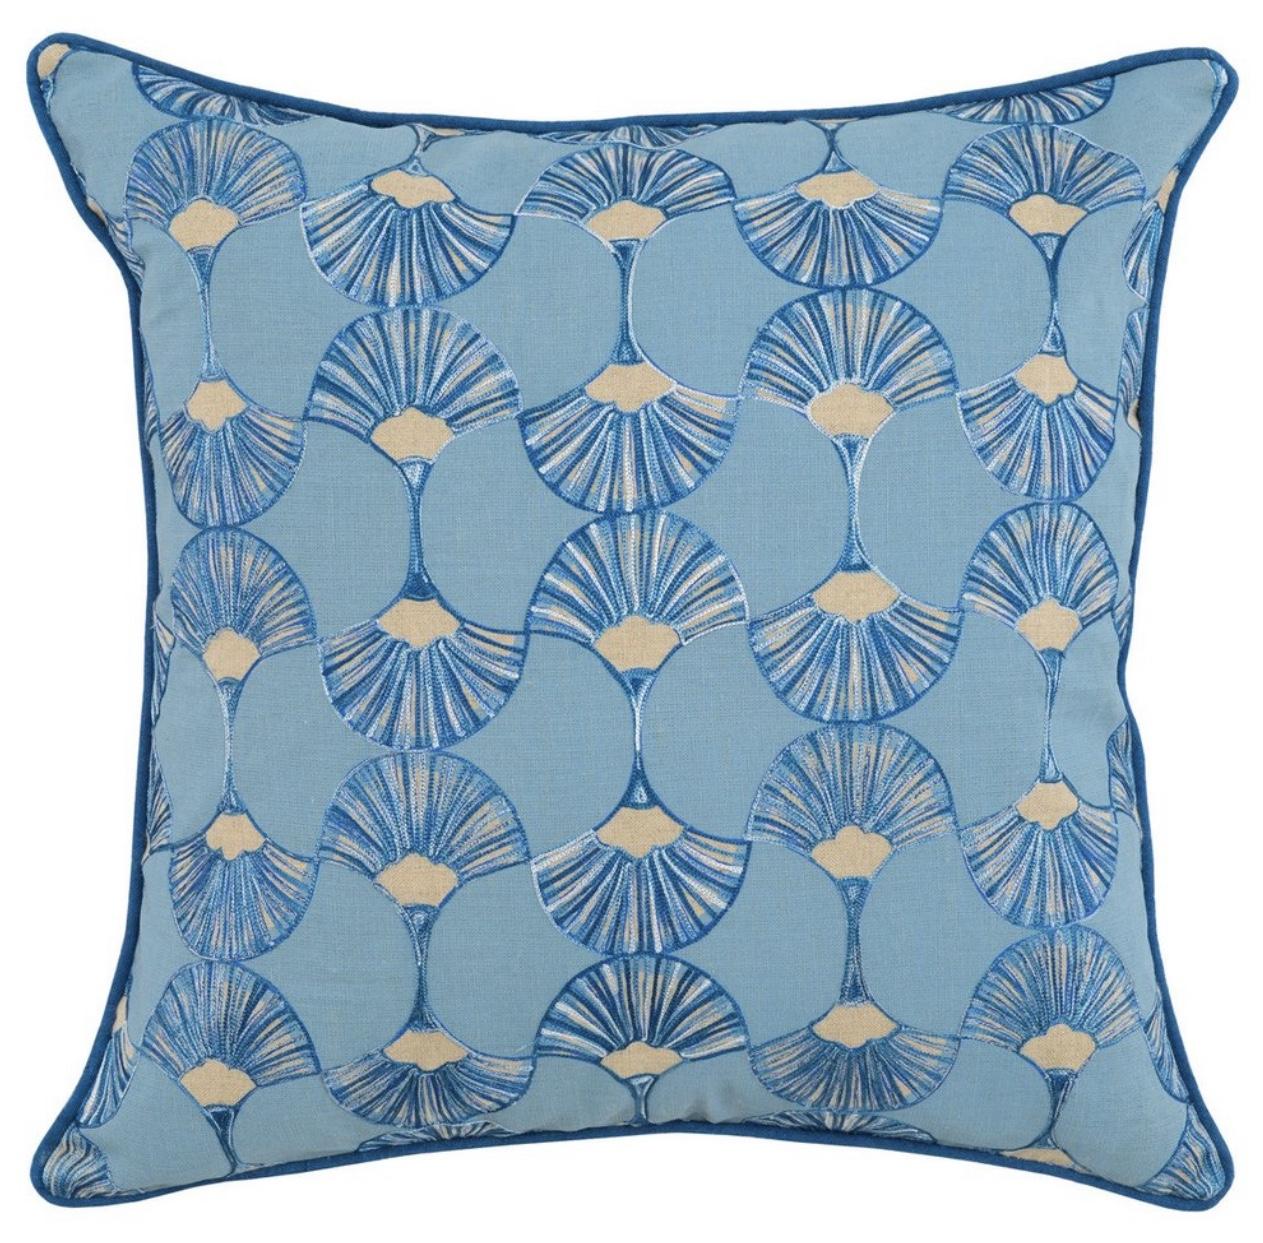 Artemis Marlin Blue Throw Pillow